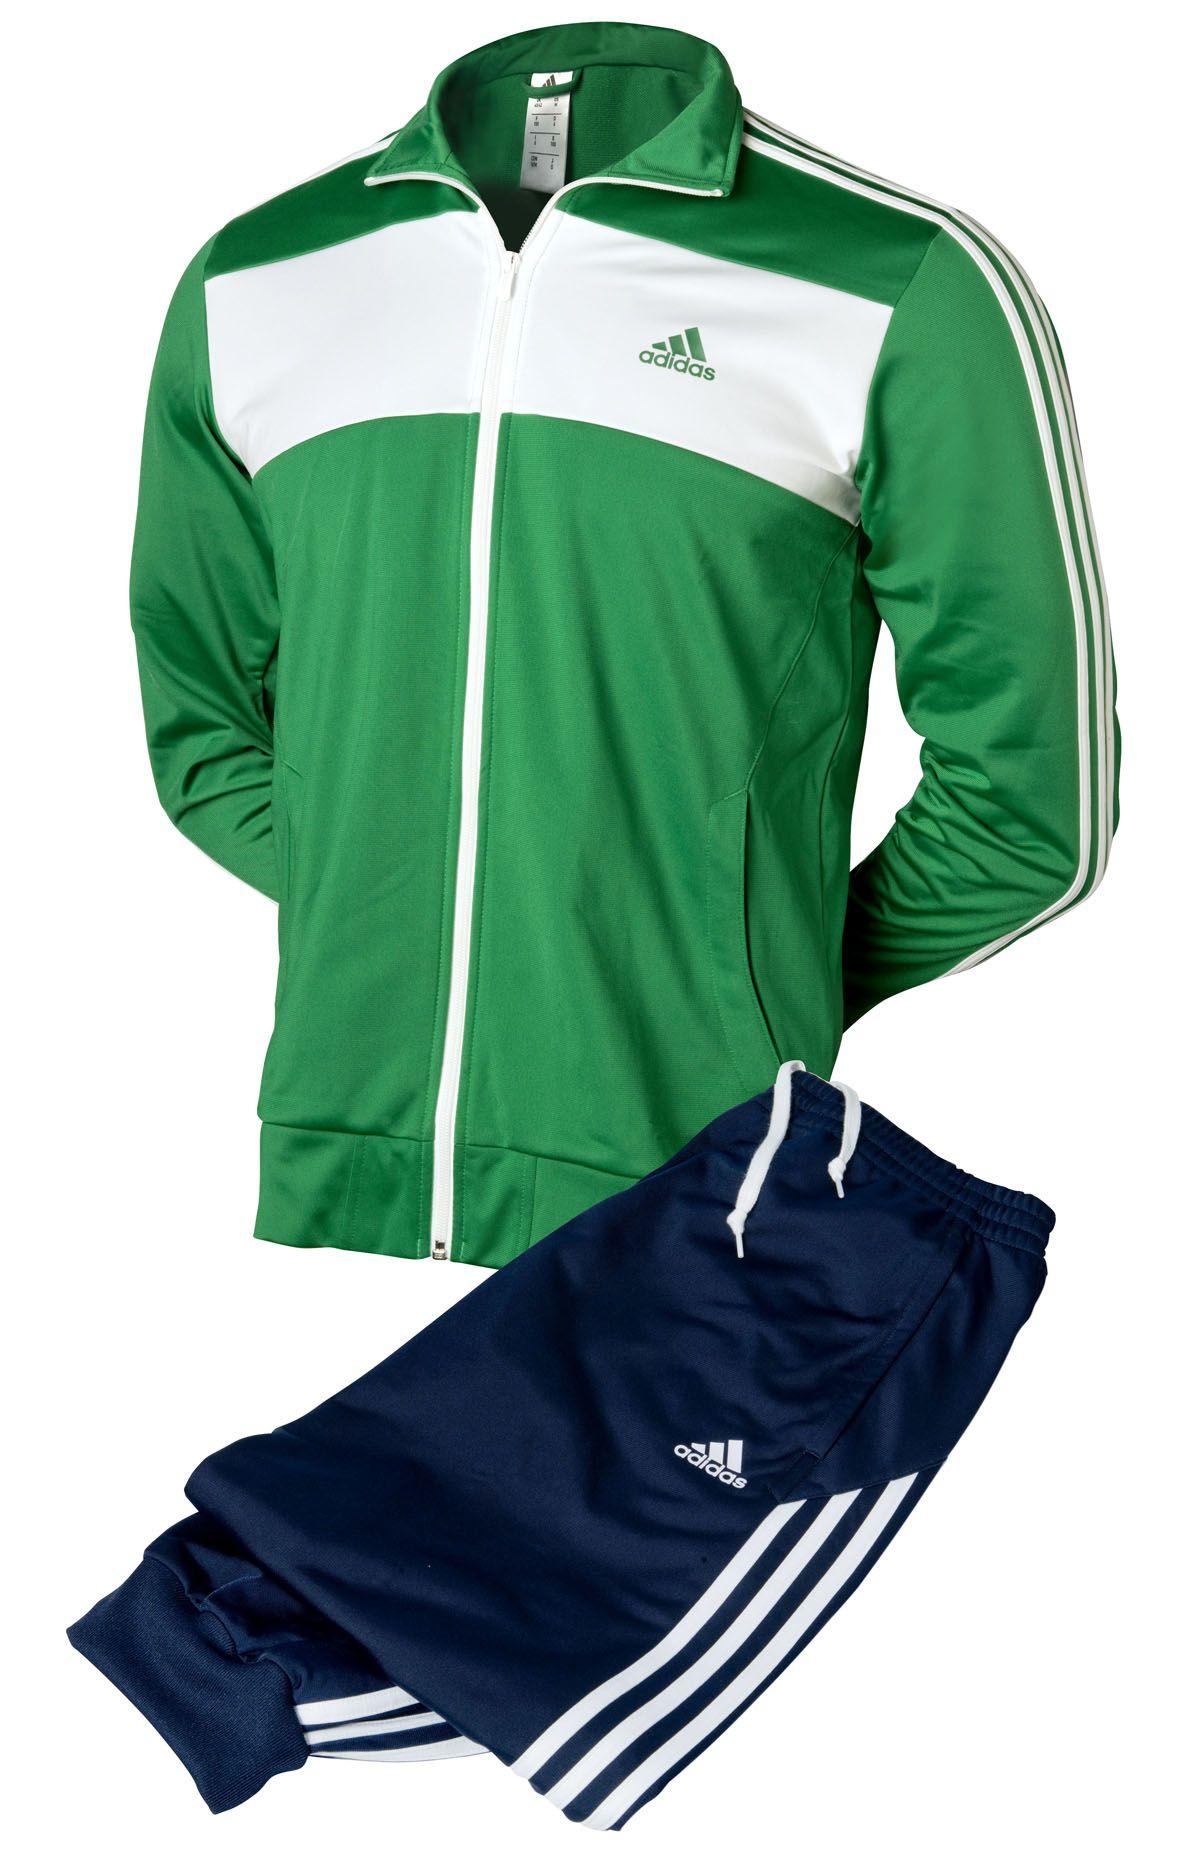 Chándal Adidas Hombre  sport  casual  moda  ropa  deporte  564d118fee70e